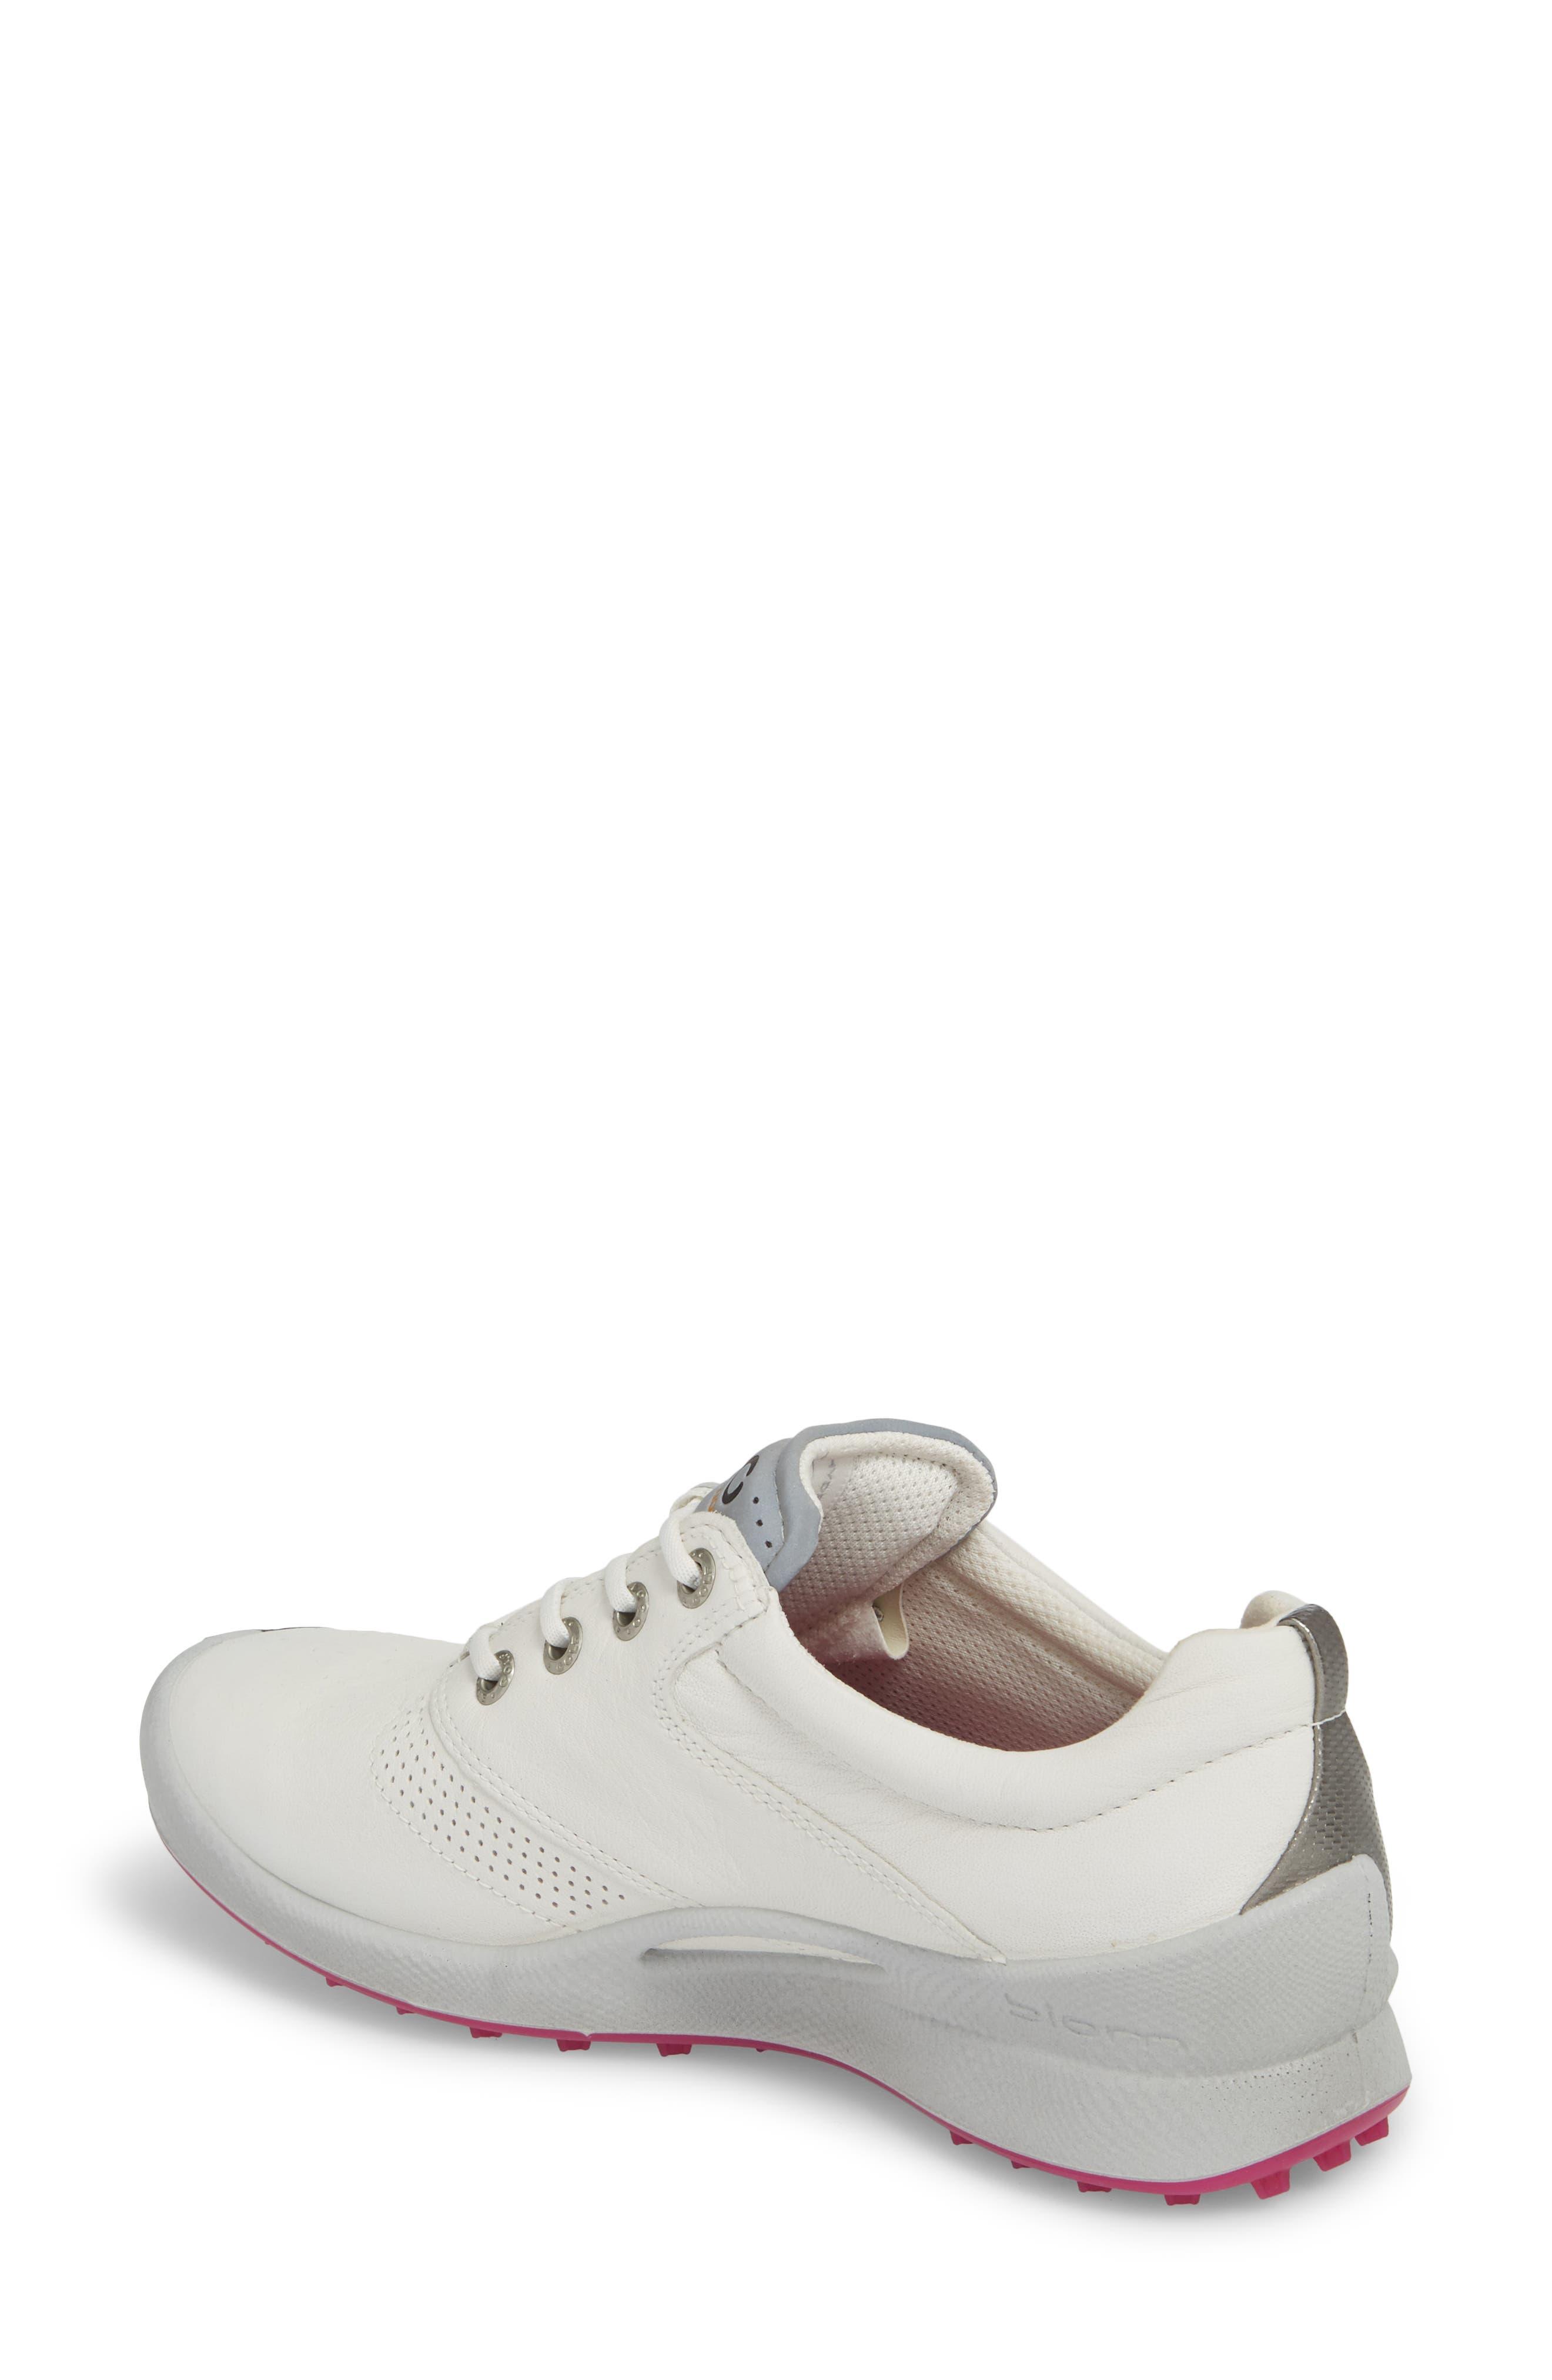 Biom Hybrid Golf Shoe,                             Alternate thumbnail 3, color,